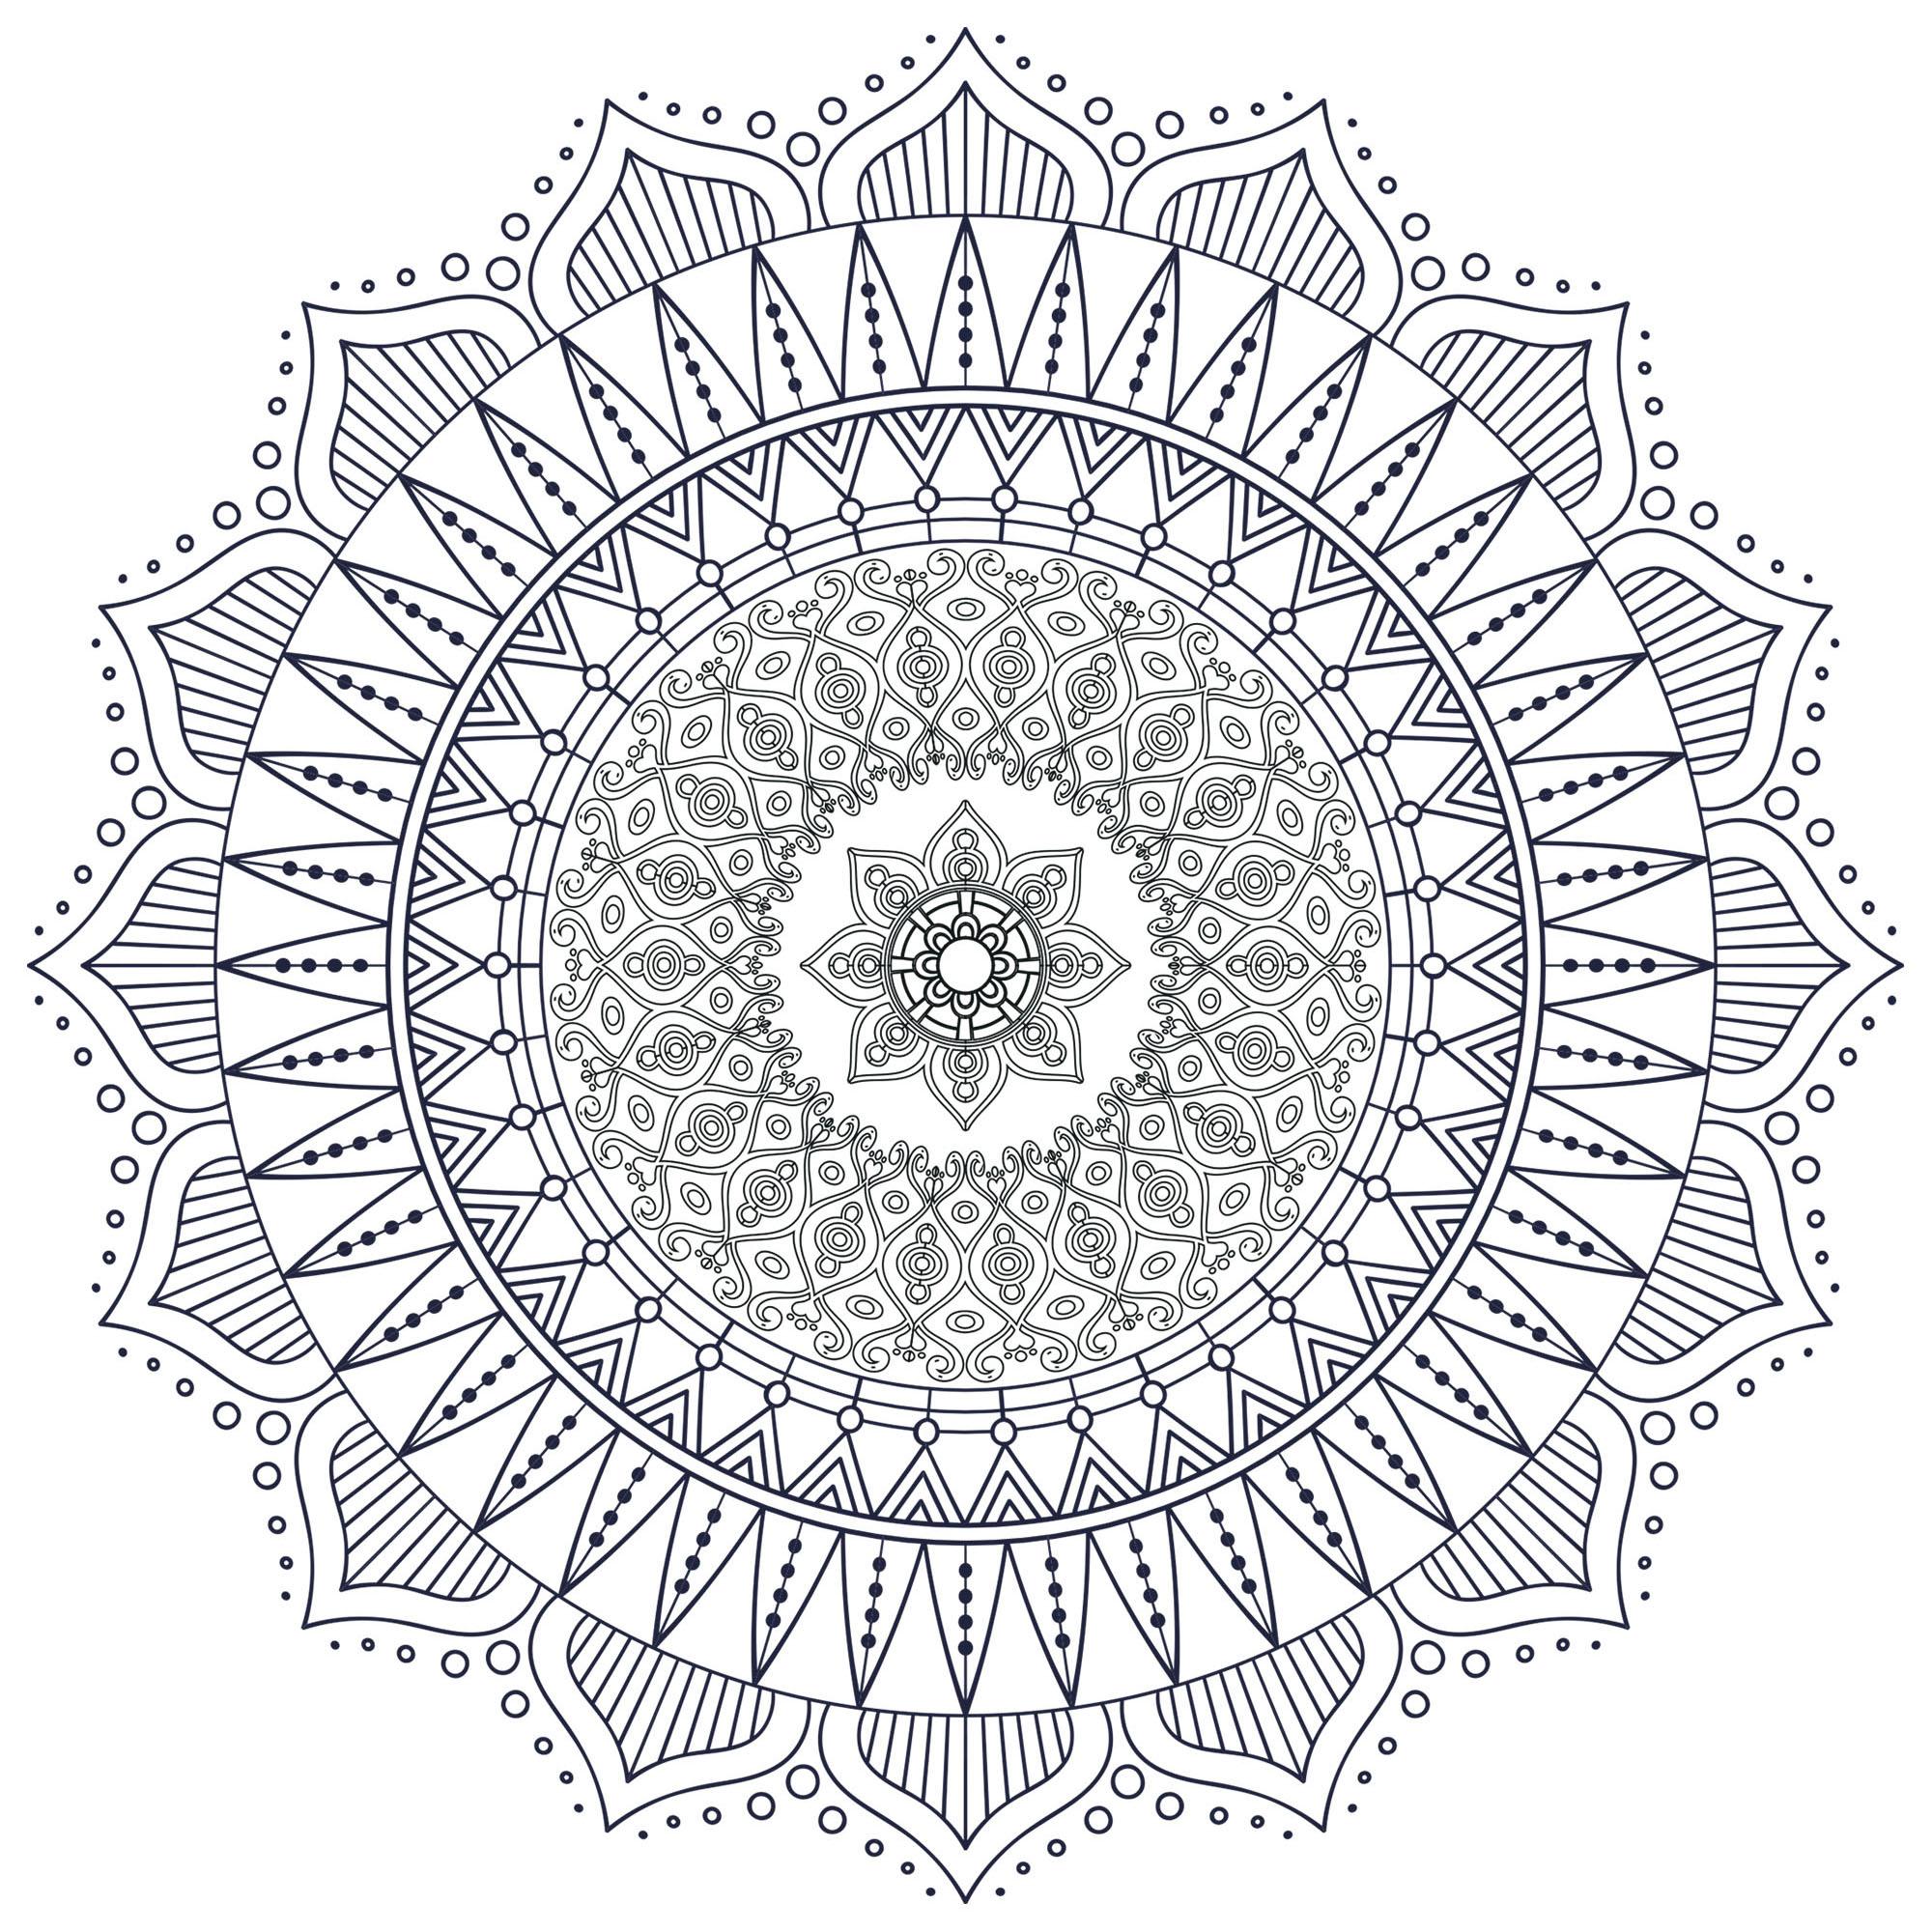 Mandala zen antistress 7 mandalas coloriages difficiles pour adultes - Dessin anti stress mandala ...